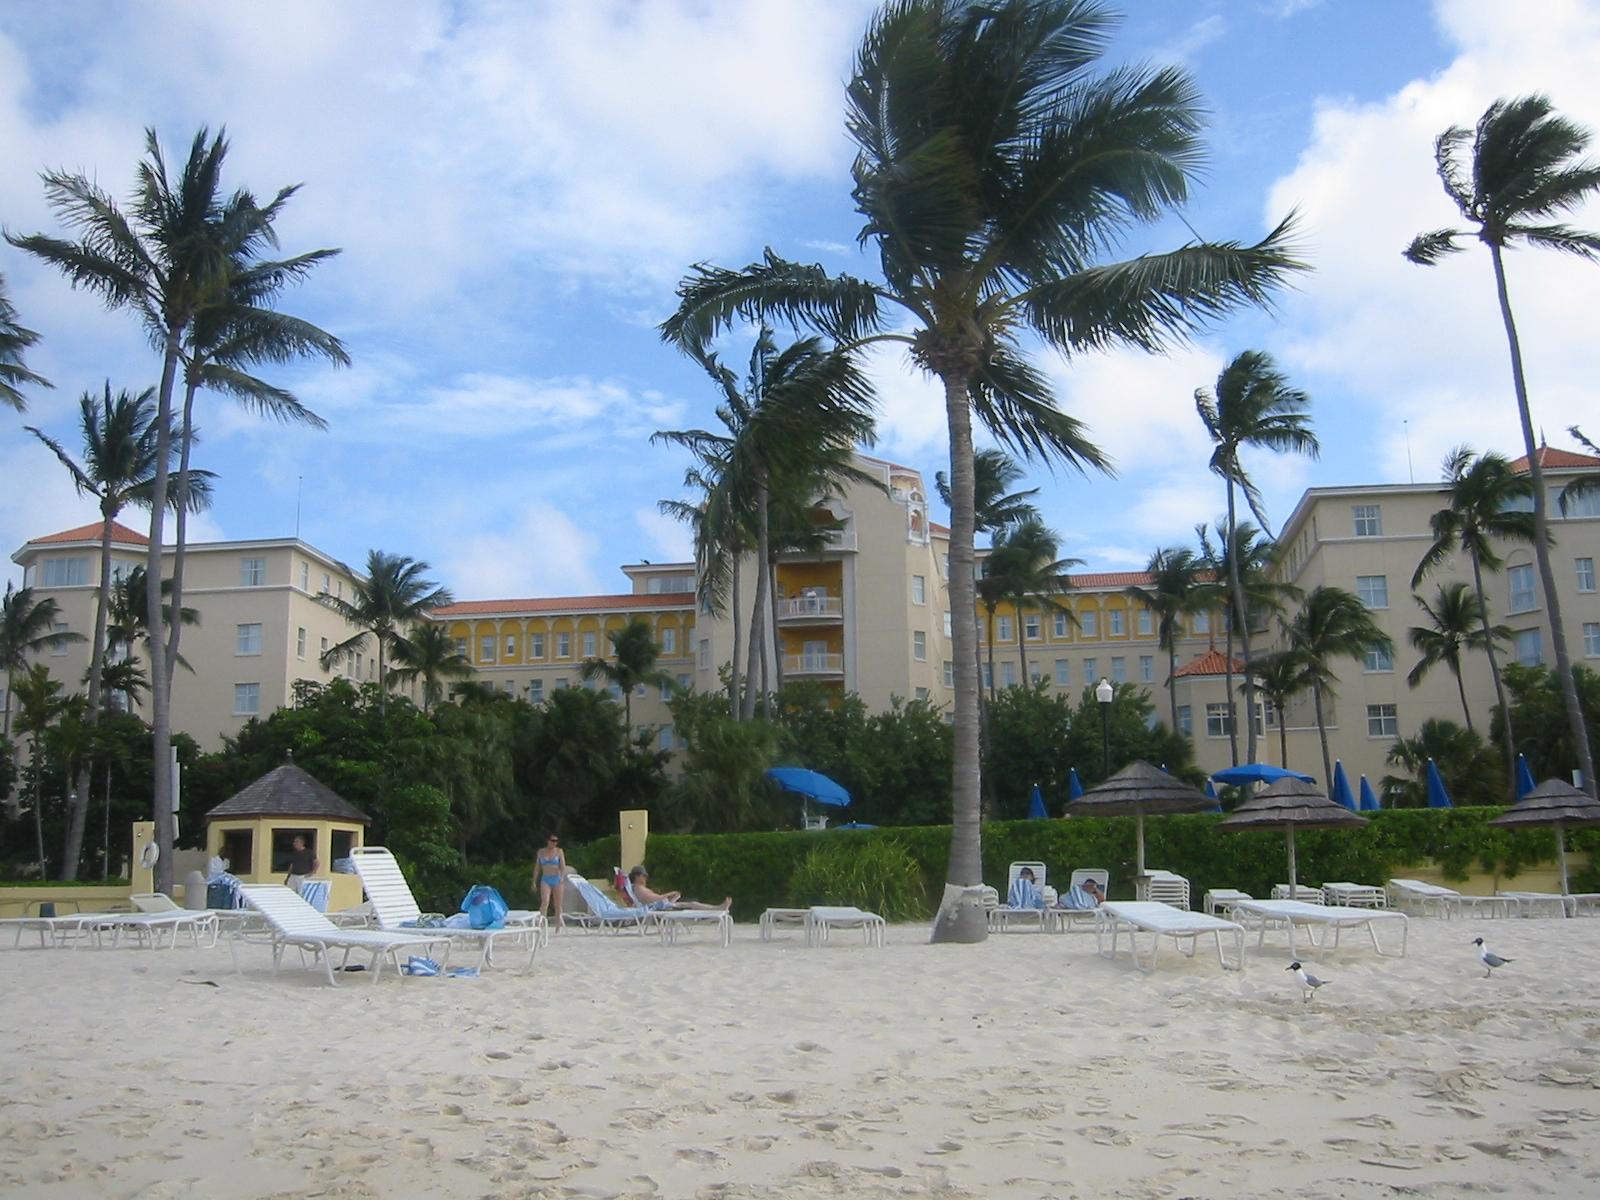 Hilton Nau Beach Jpg Wikimedia Commons